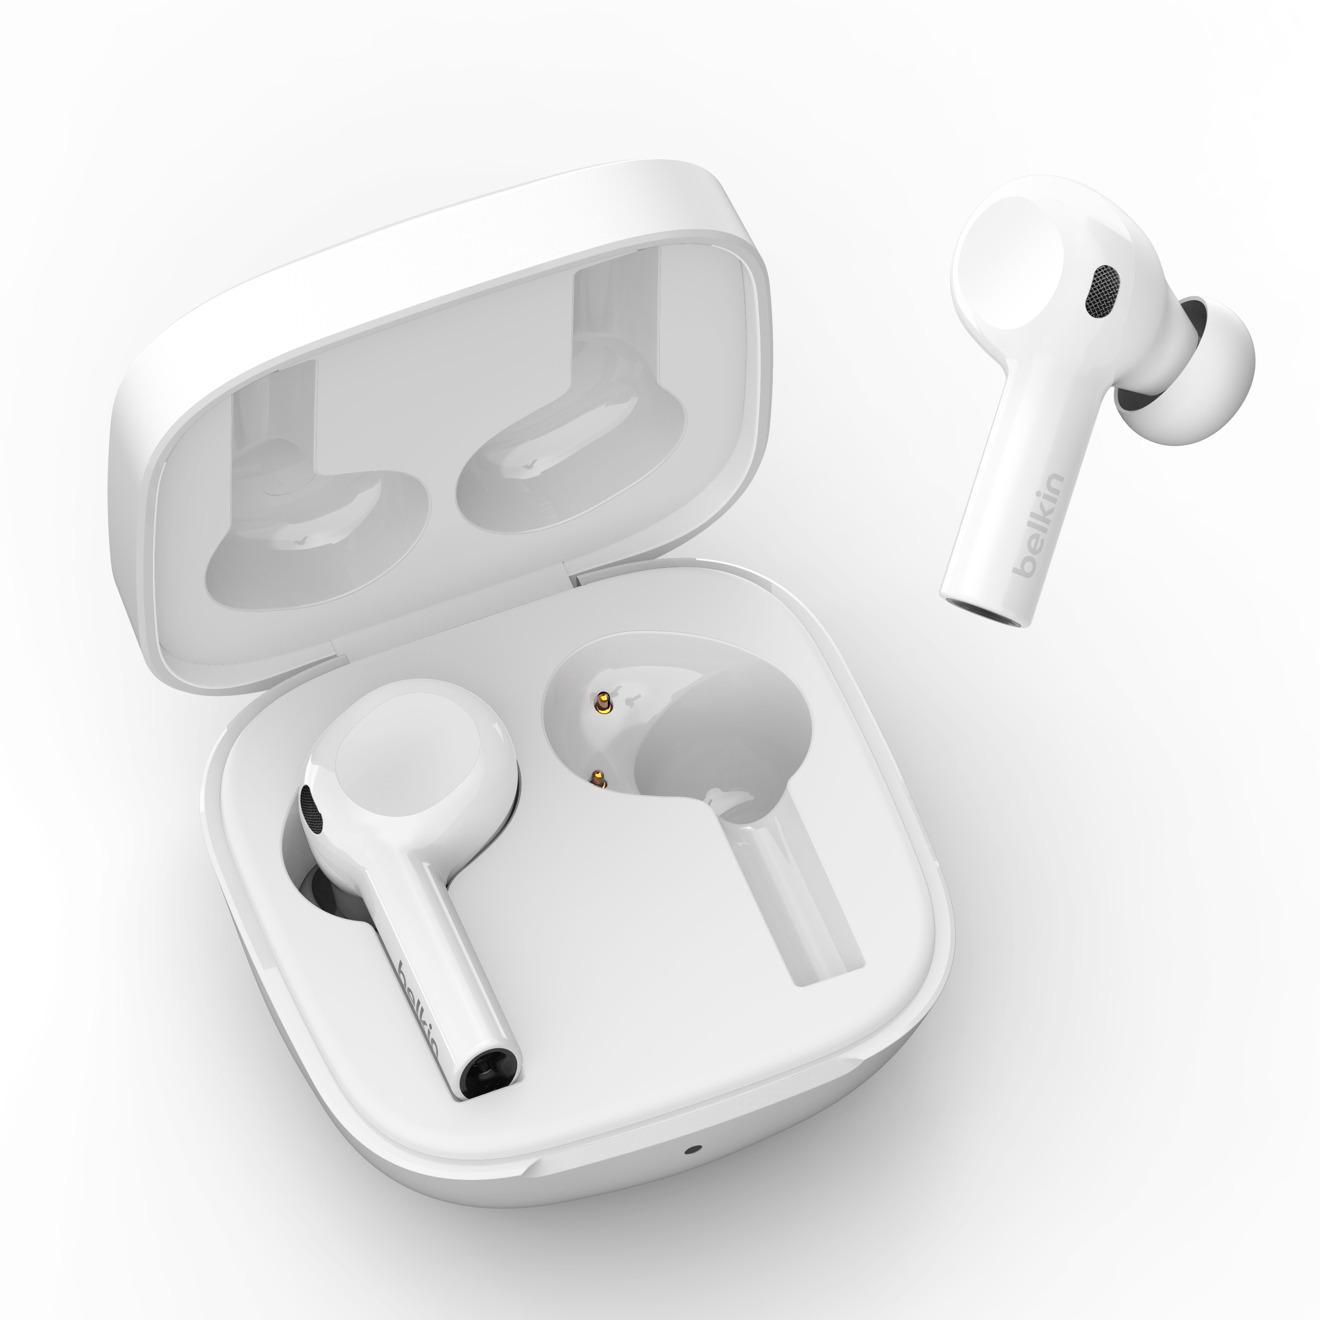 SoundForm Freedom True Wireless Earbuds